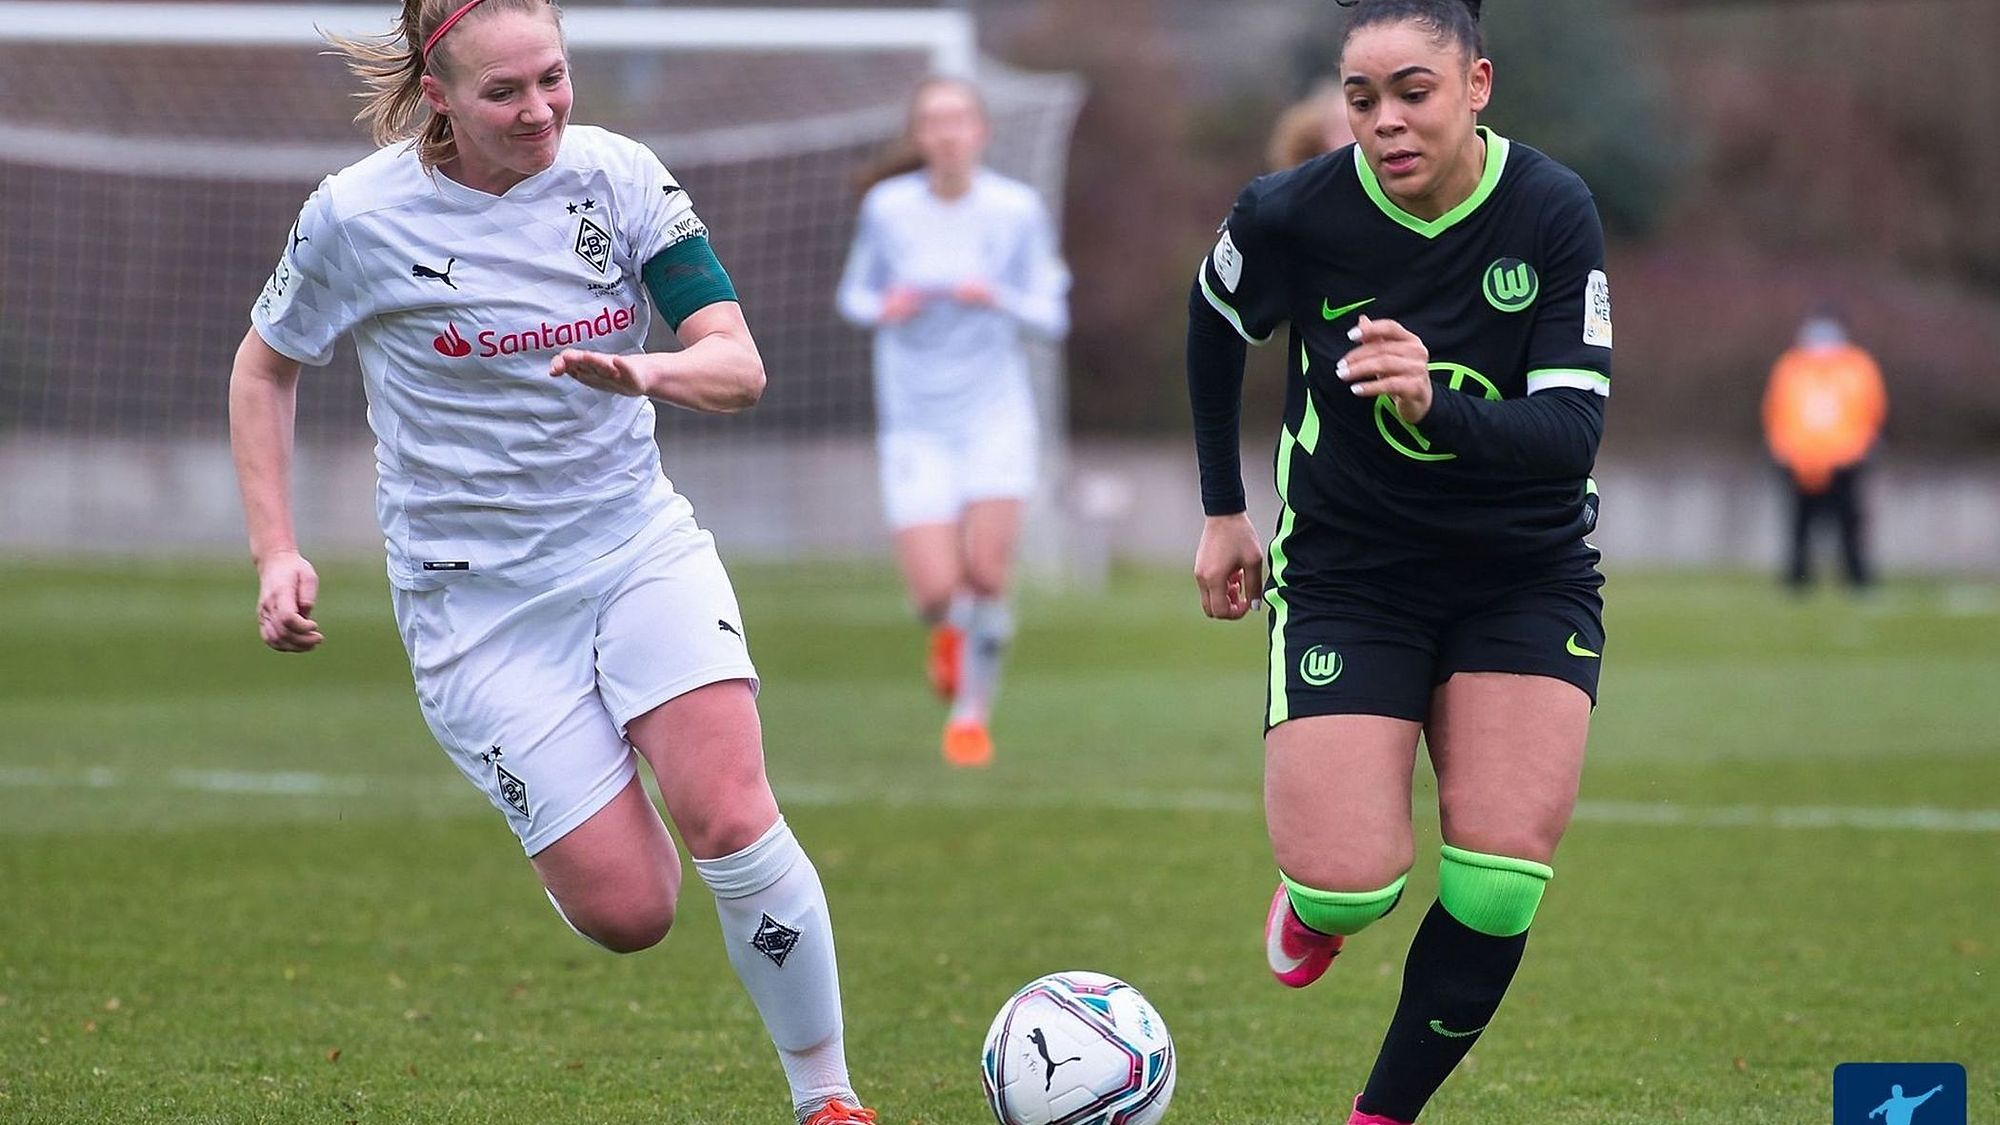 Borussia-Frauen treffen auf Gütersloh - FuPa